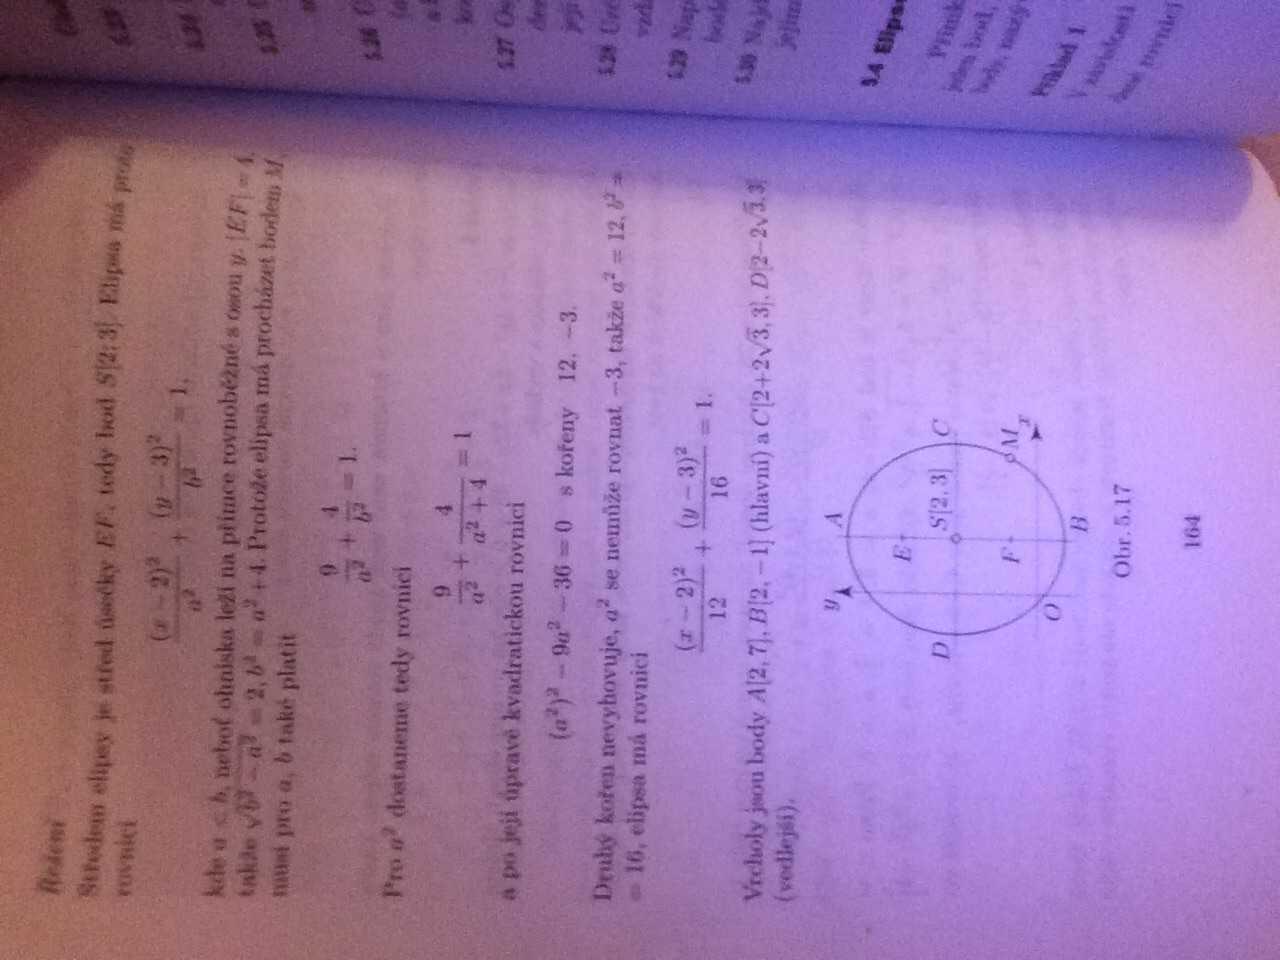 http://forum.matematika.cz/upload3/img/2018-02/23227_image.jpg